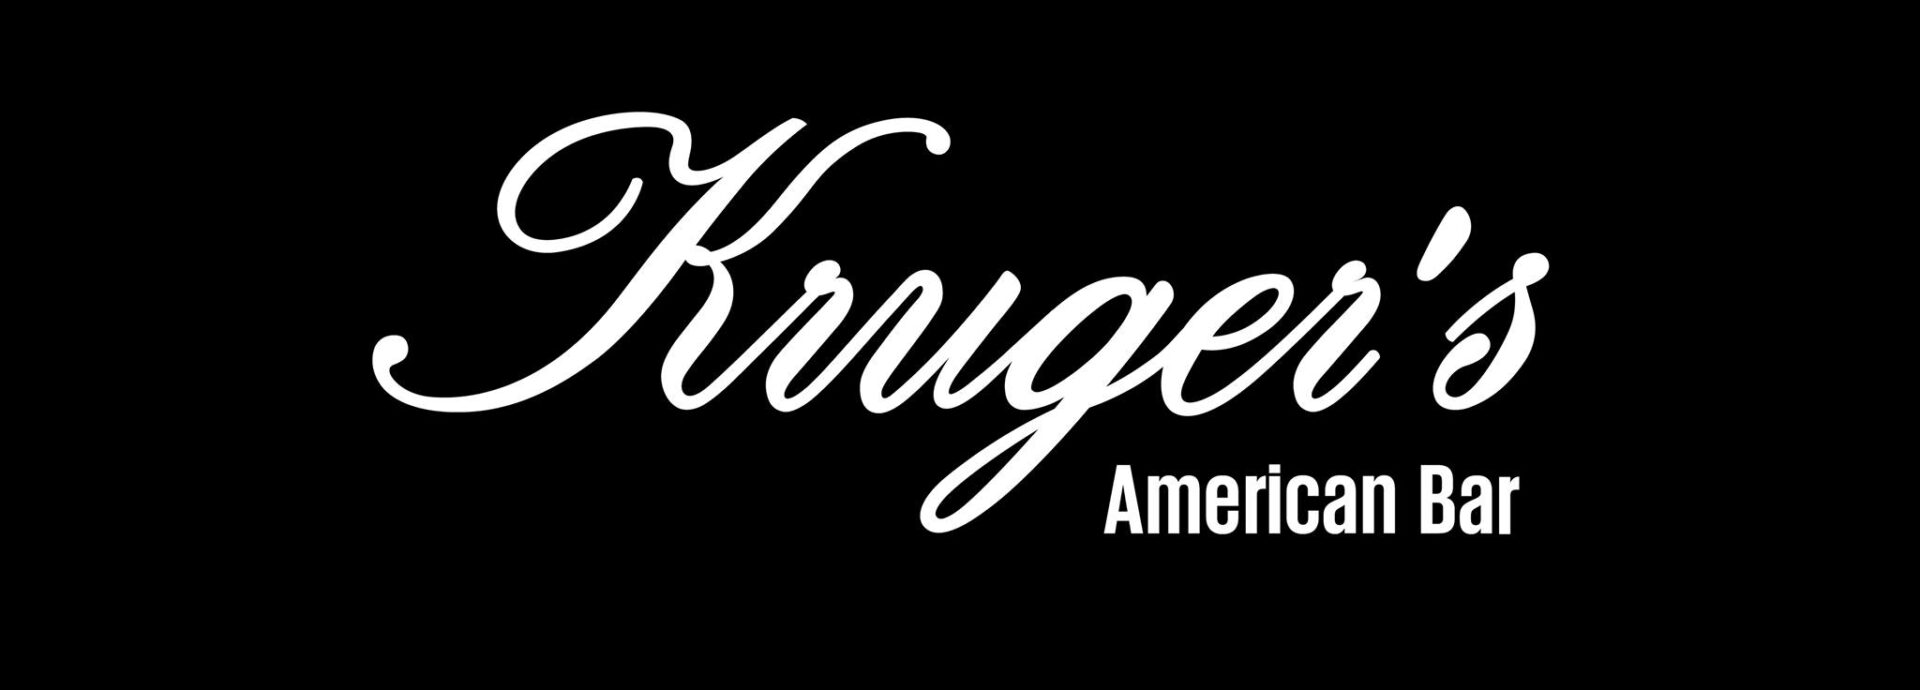 Krugers American Bar